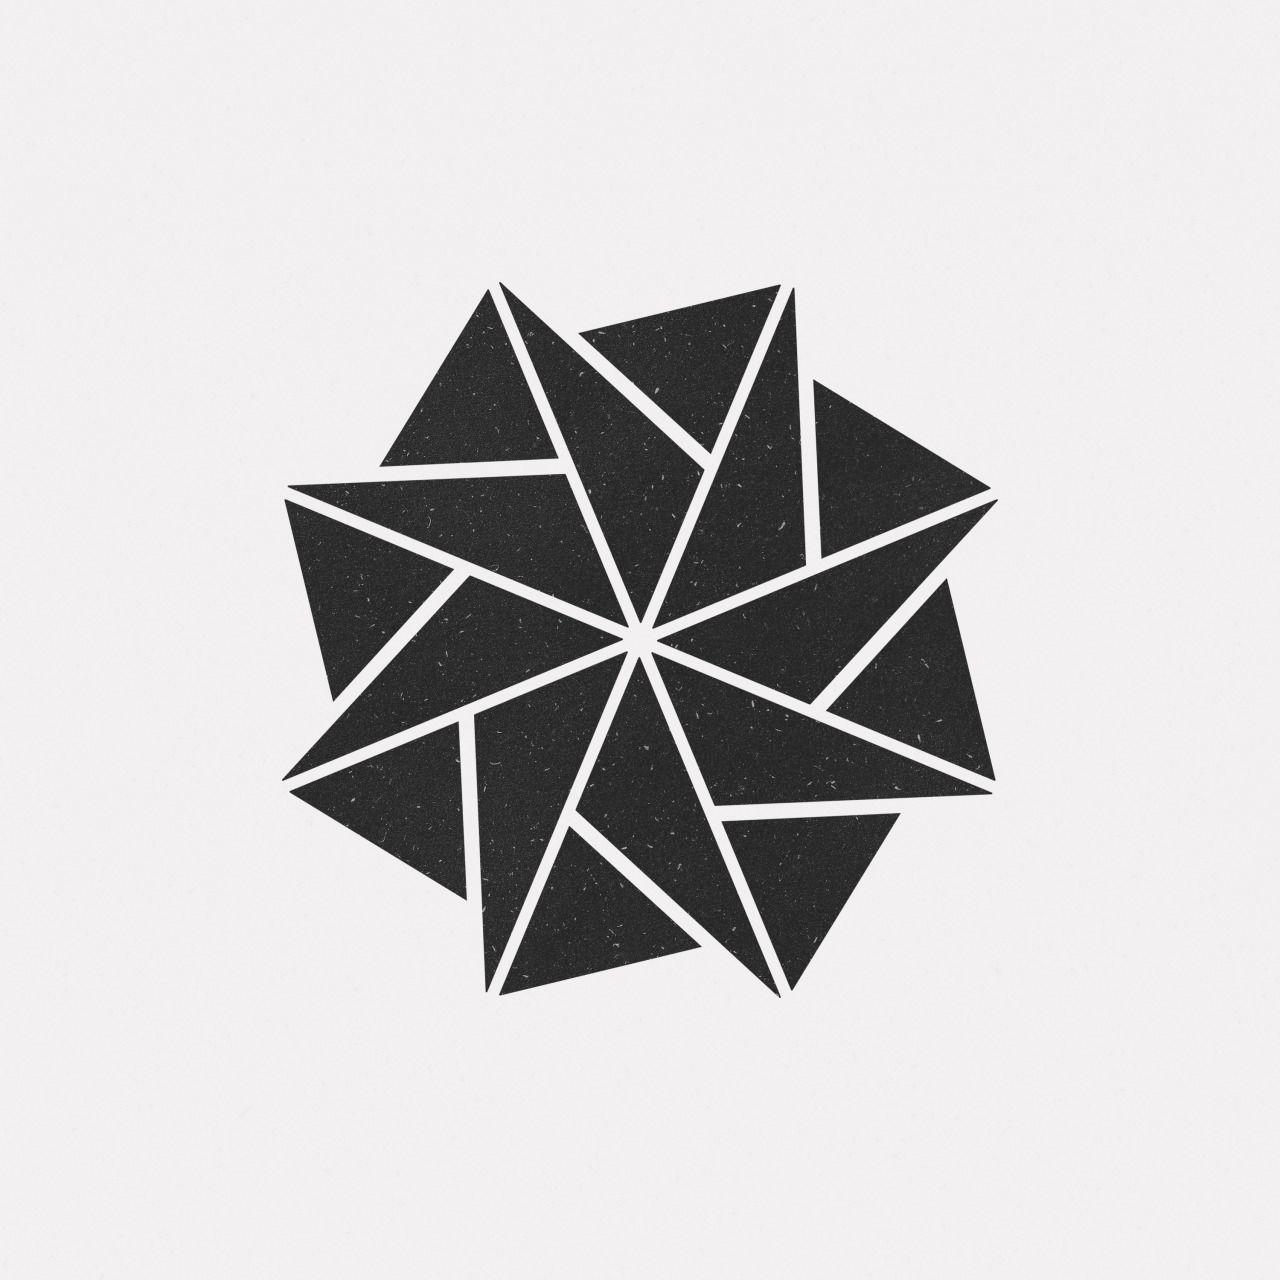 au15 304a new geometric design every day